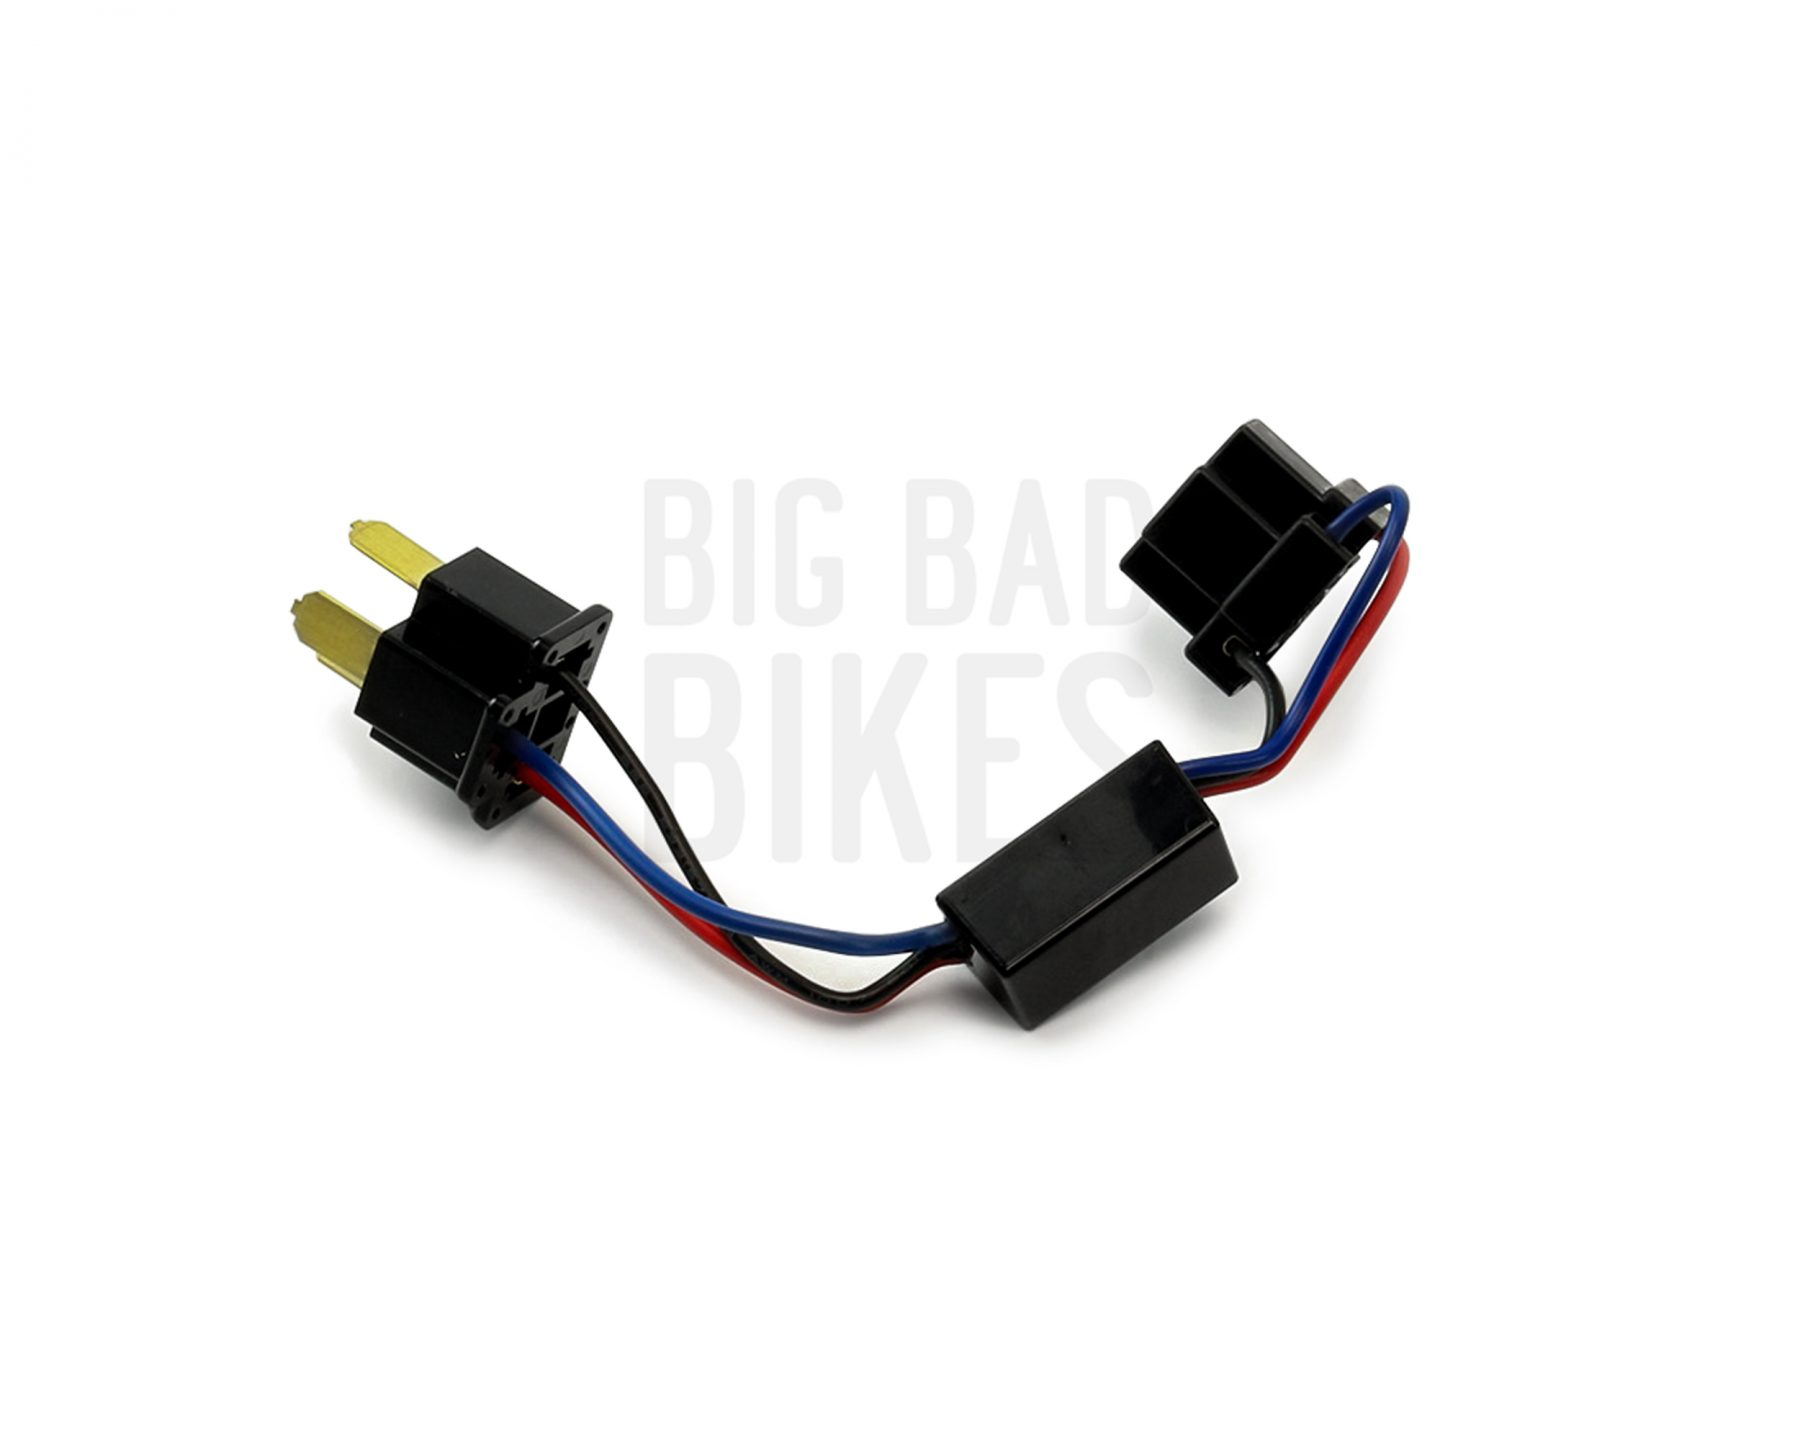 denali all on combination low beam with high beam conversion rh bigbadbikes com h4 headlight relay wiring harness